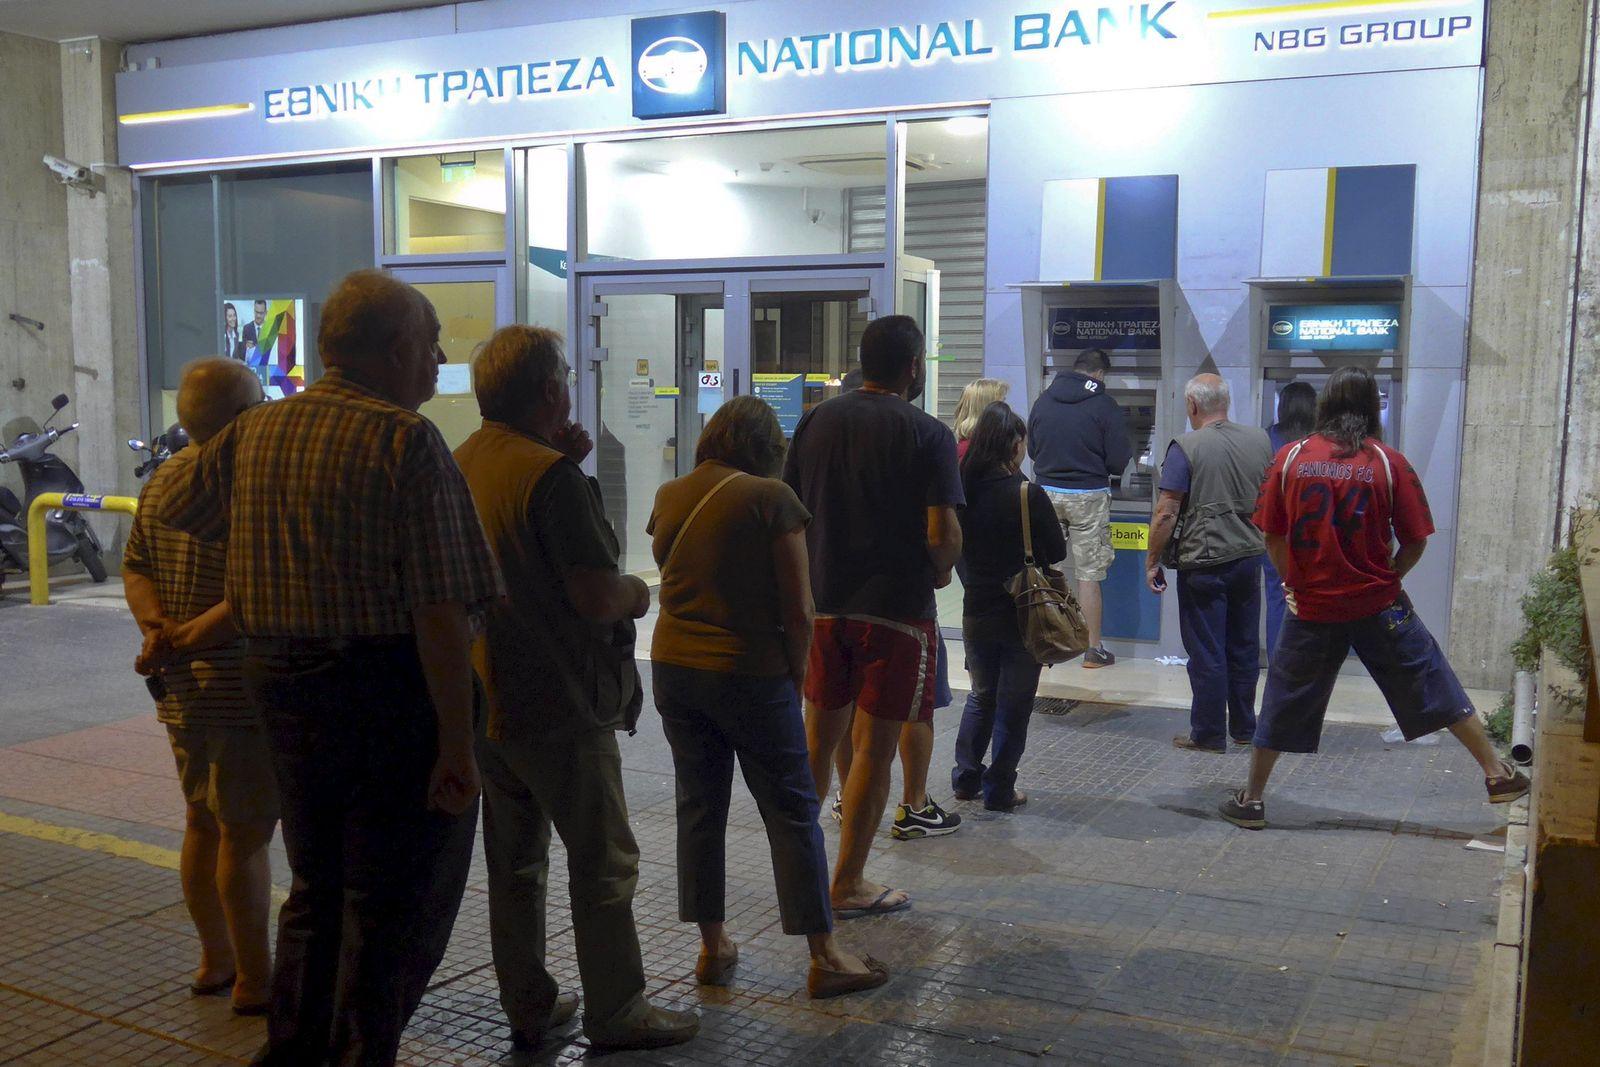 Griechenland/ Kriese/ Banken/ Geldautomaten/ Schlangen